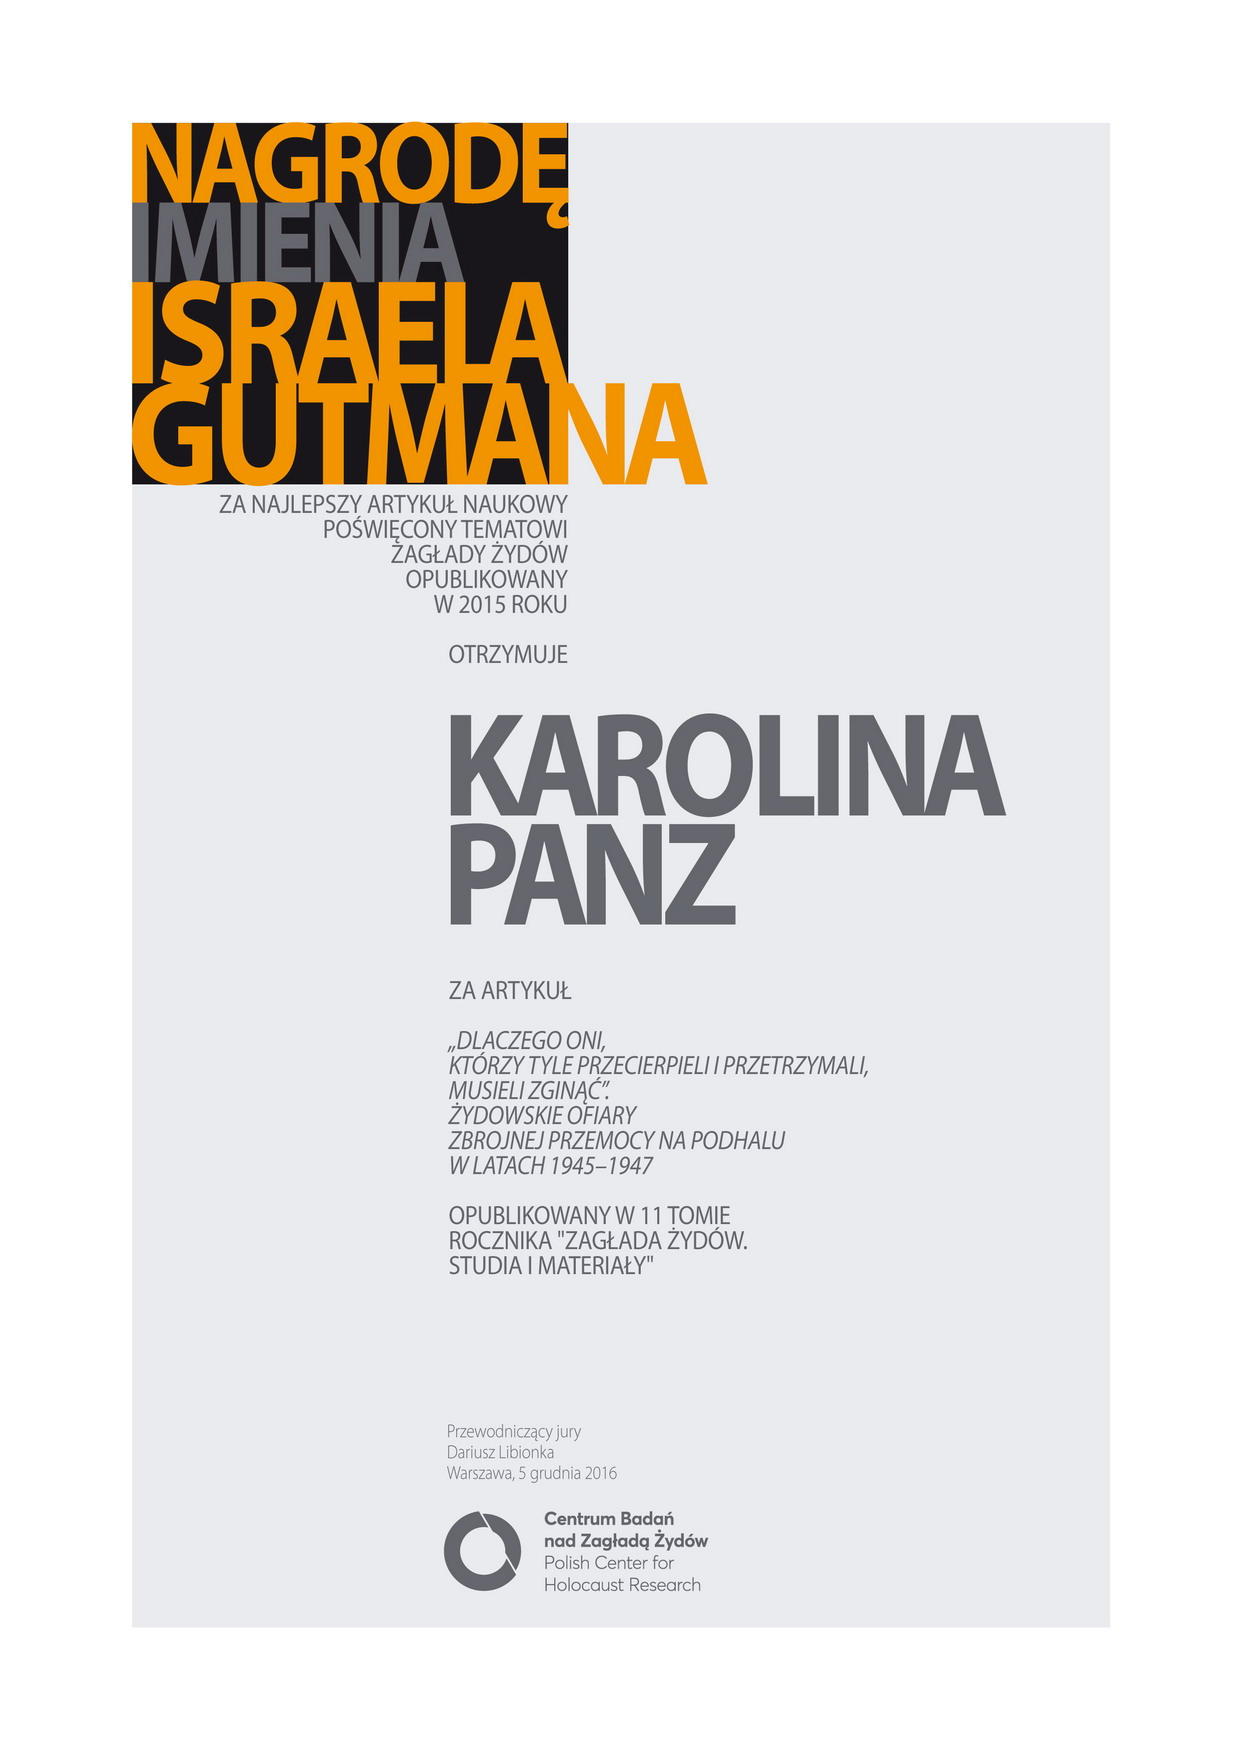 Dyplom Nagrody im. Israela Gutmana - Karolina PANZ 2016